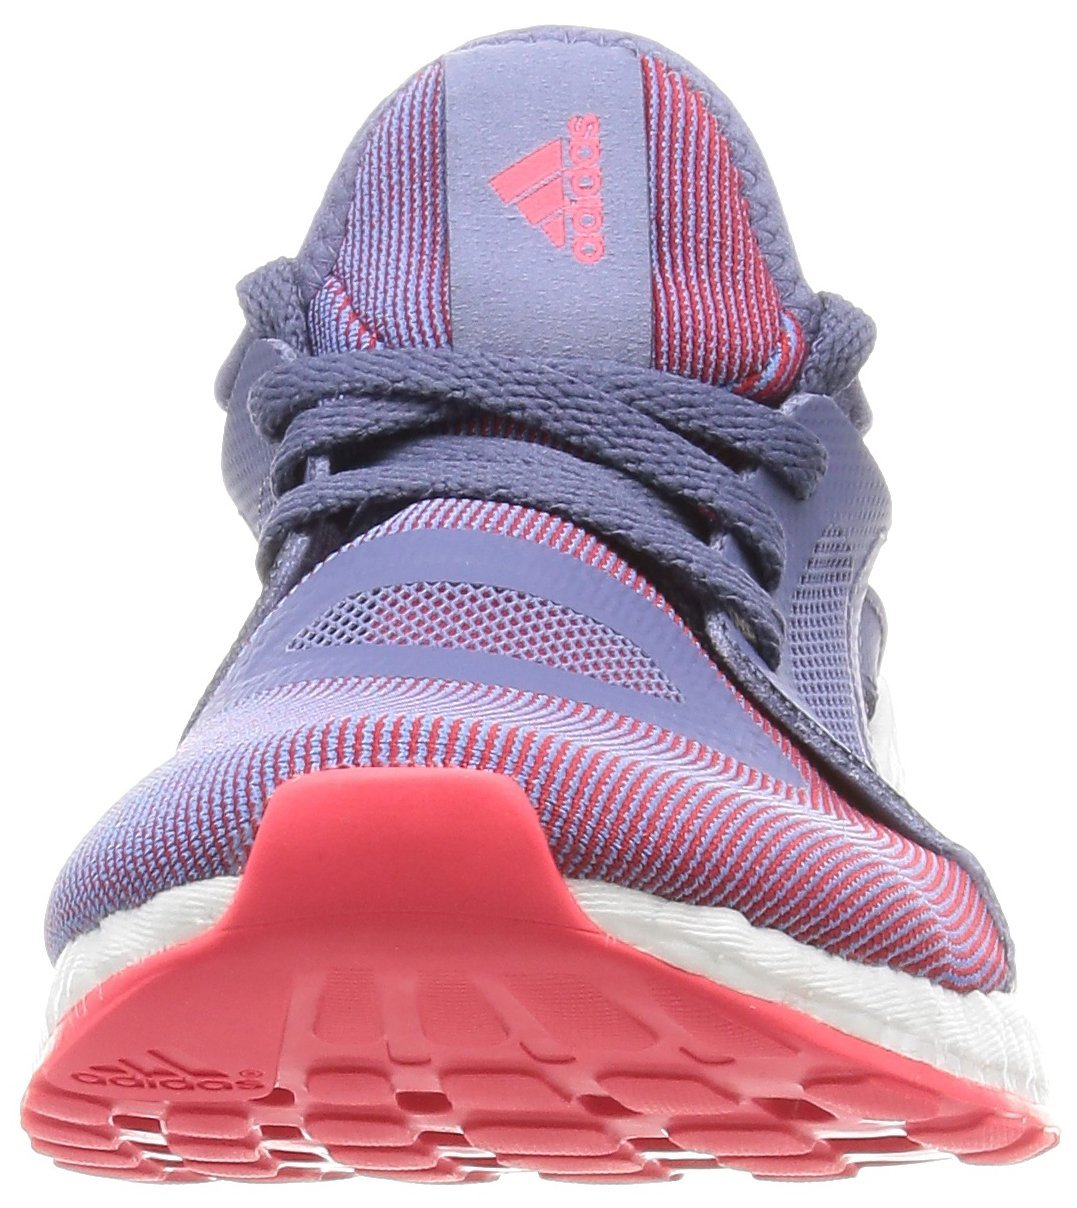 new arrival 4ce58 92b65 ... Zapatillas de deporte zapatillas zapatillas para correr adidas para  Zapatillas Pureboost X para mujer Púrpura cca32d6  Blanco ...